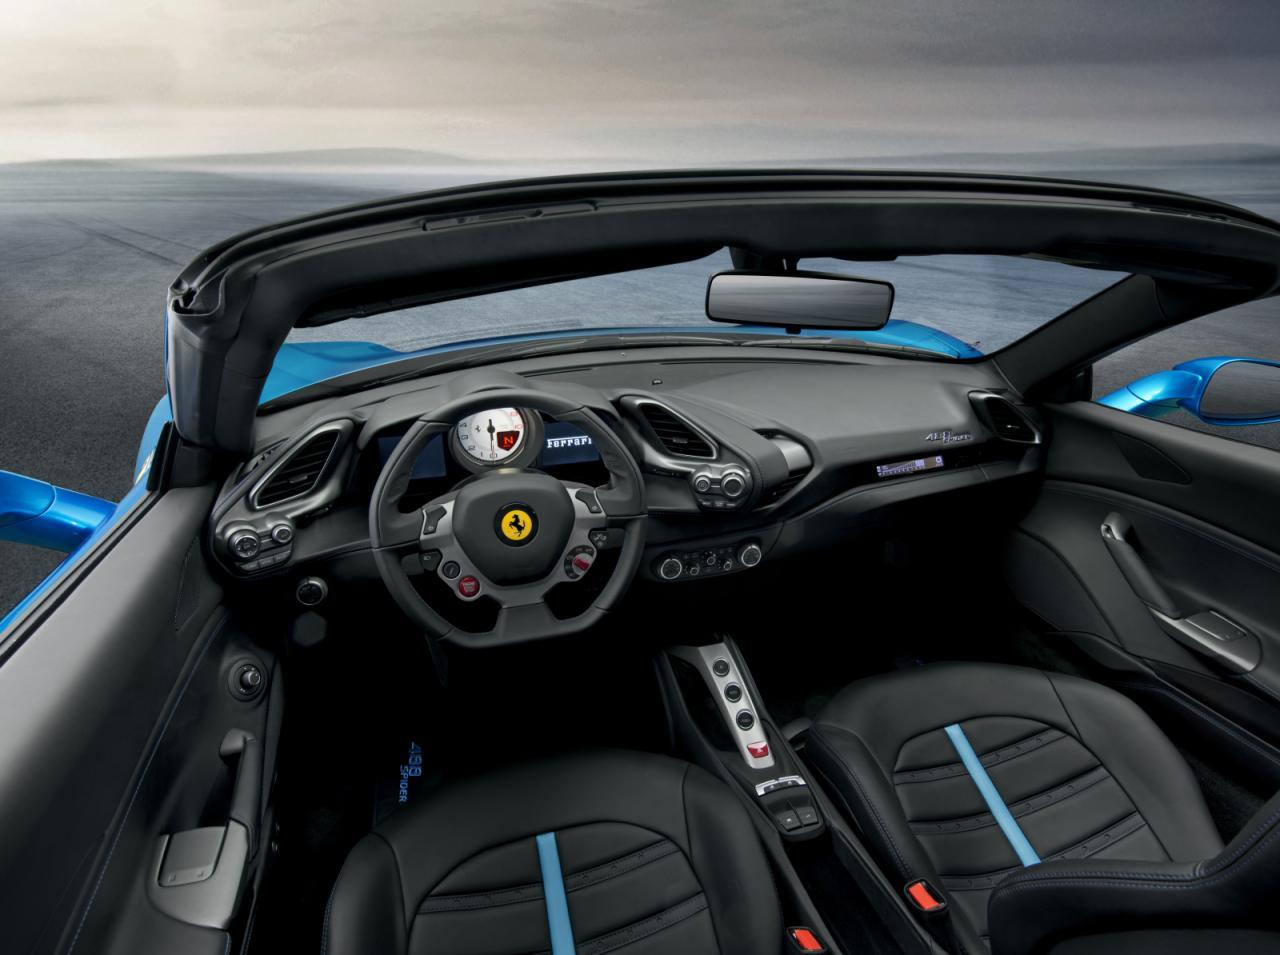 Oficial: Ferrari 488 Spider, llega el descapotable de Maranello con 670 caballos por bandera 2